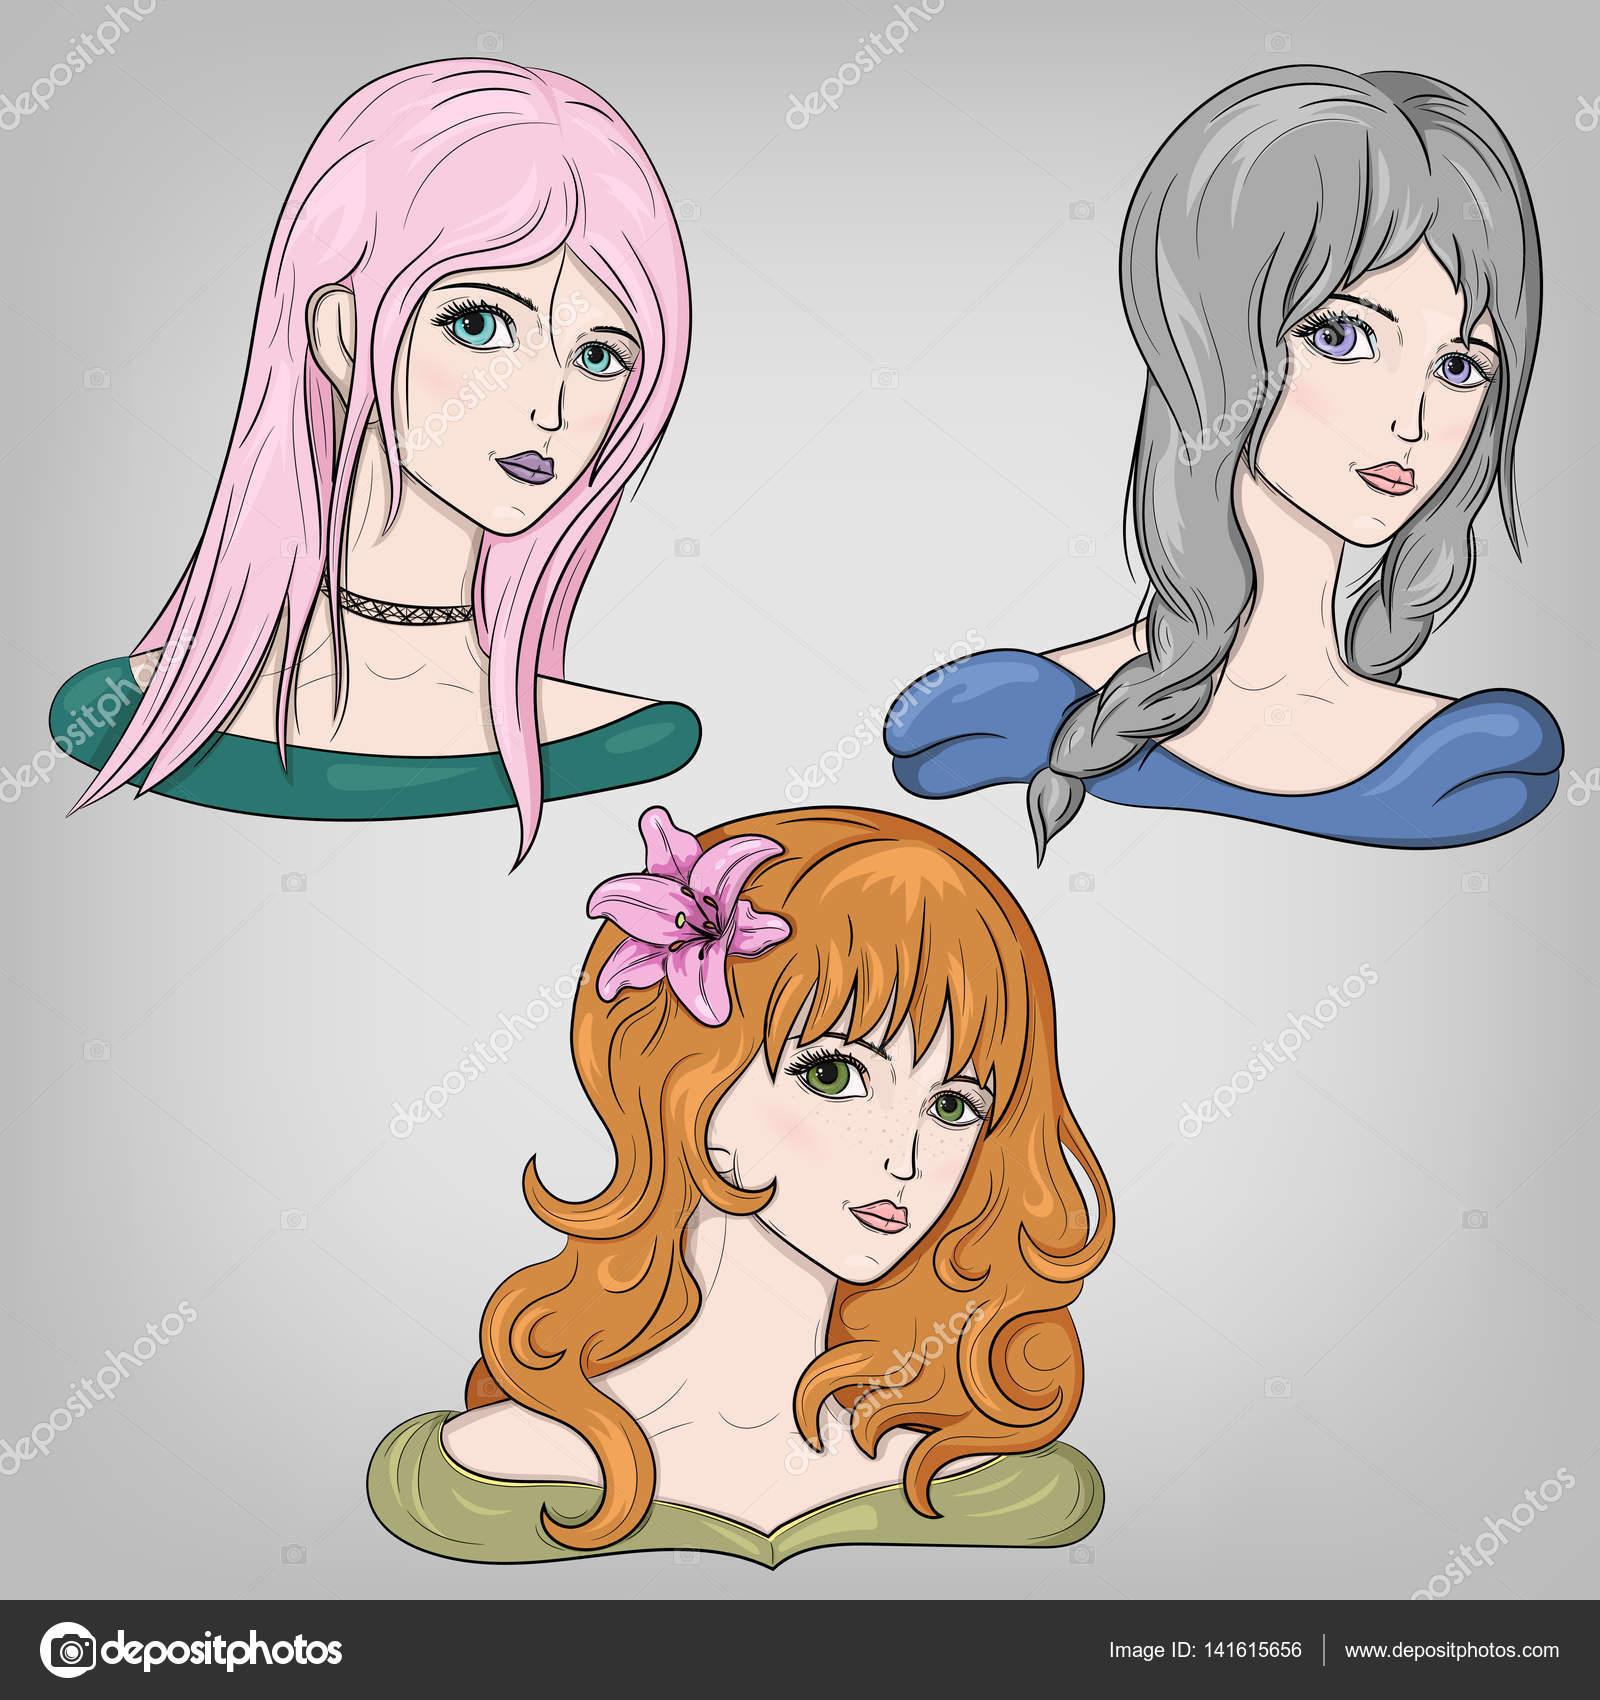 Vector Chicas Anime Juego De Chicas De Anime Retratos Femeninos